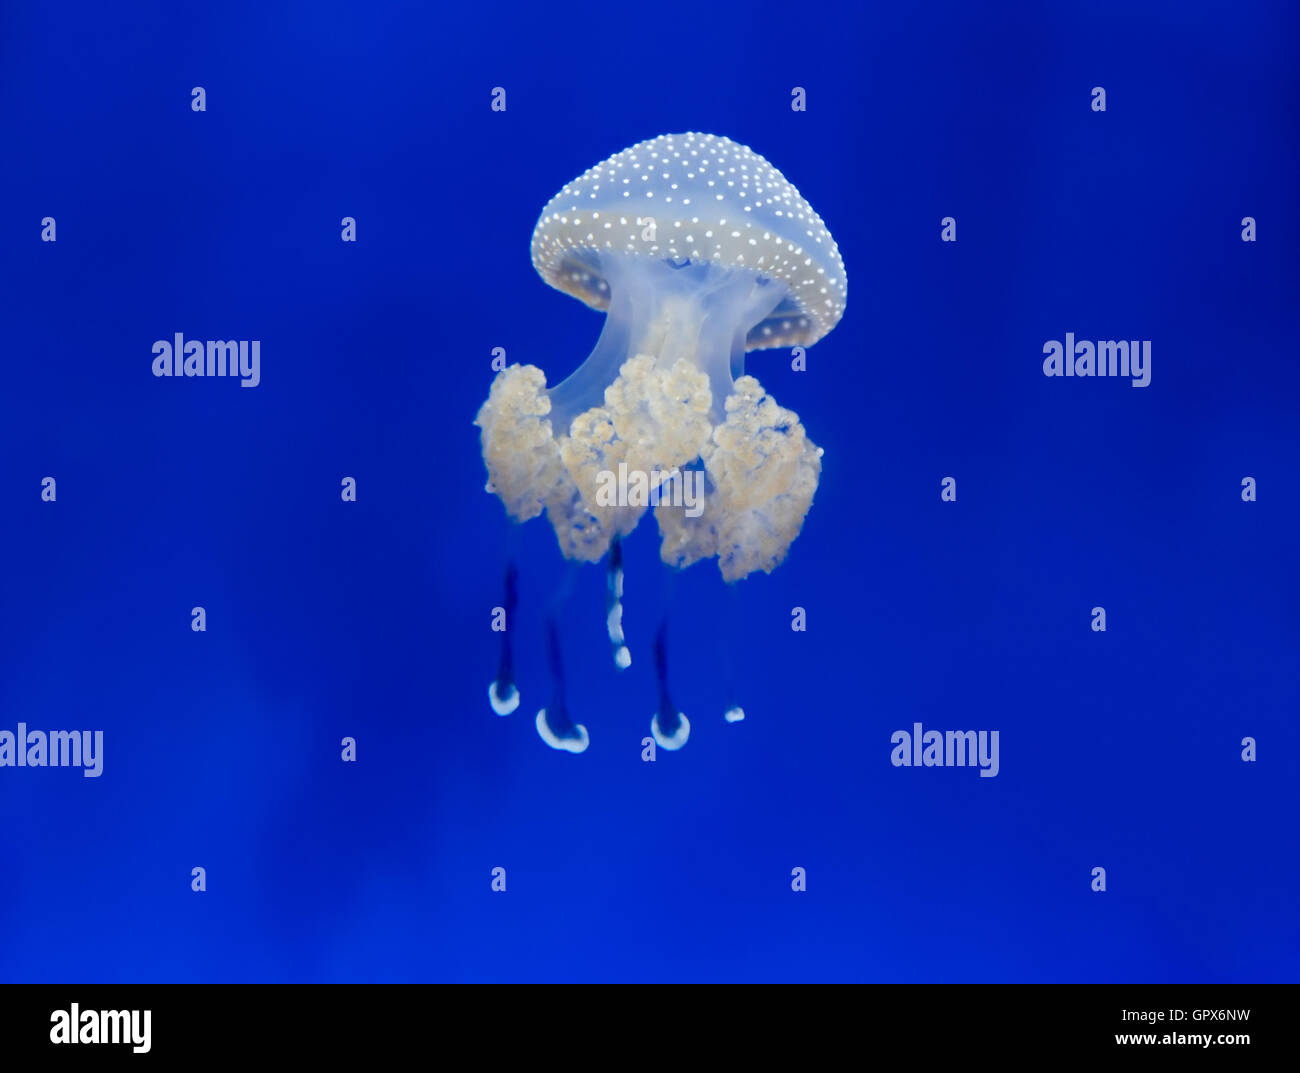 medusa jellyfish underwater diving photo egypt red sea Stock Photo